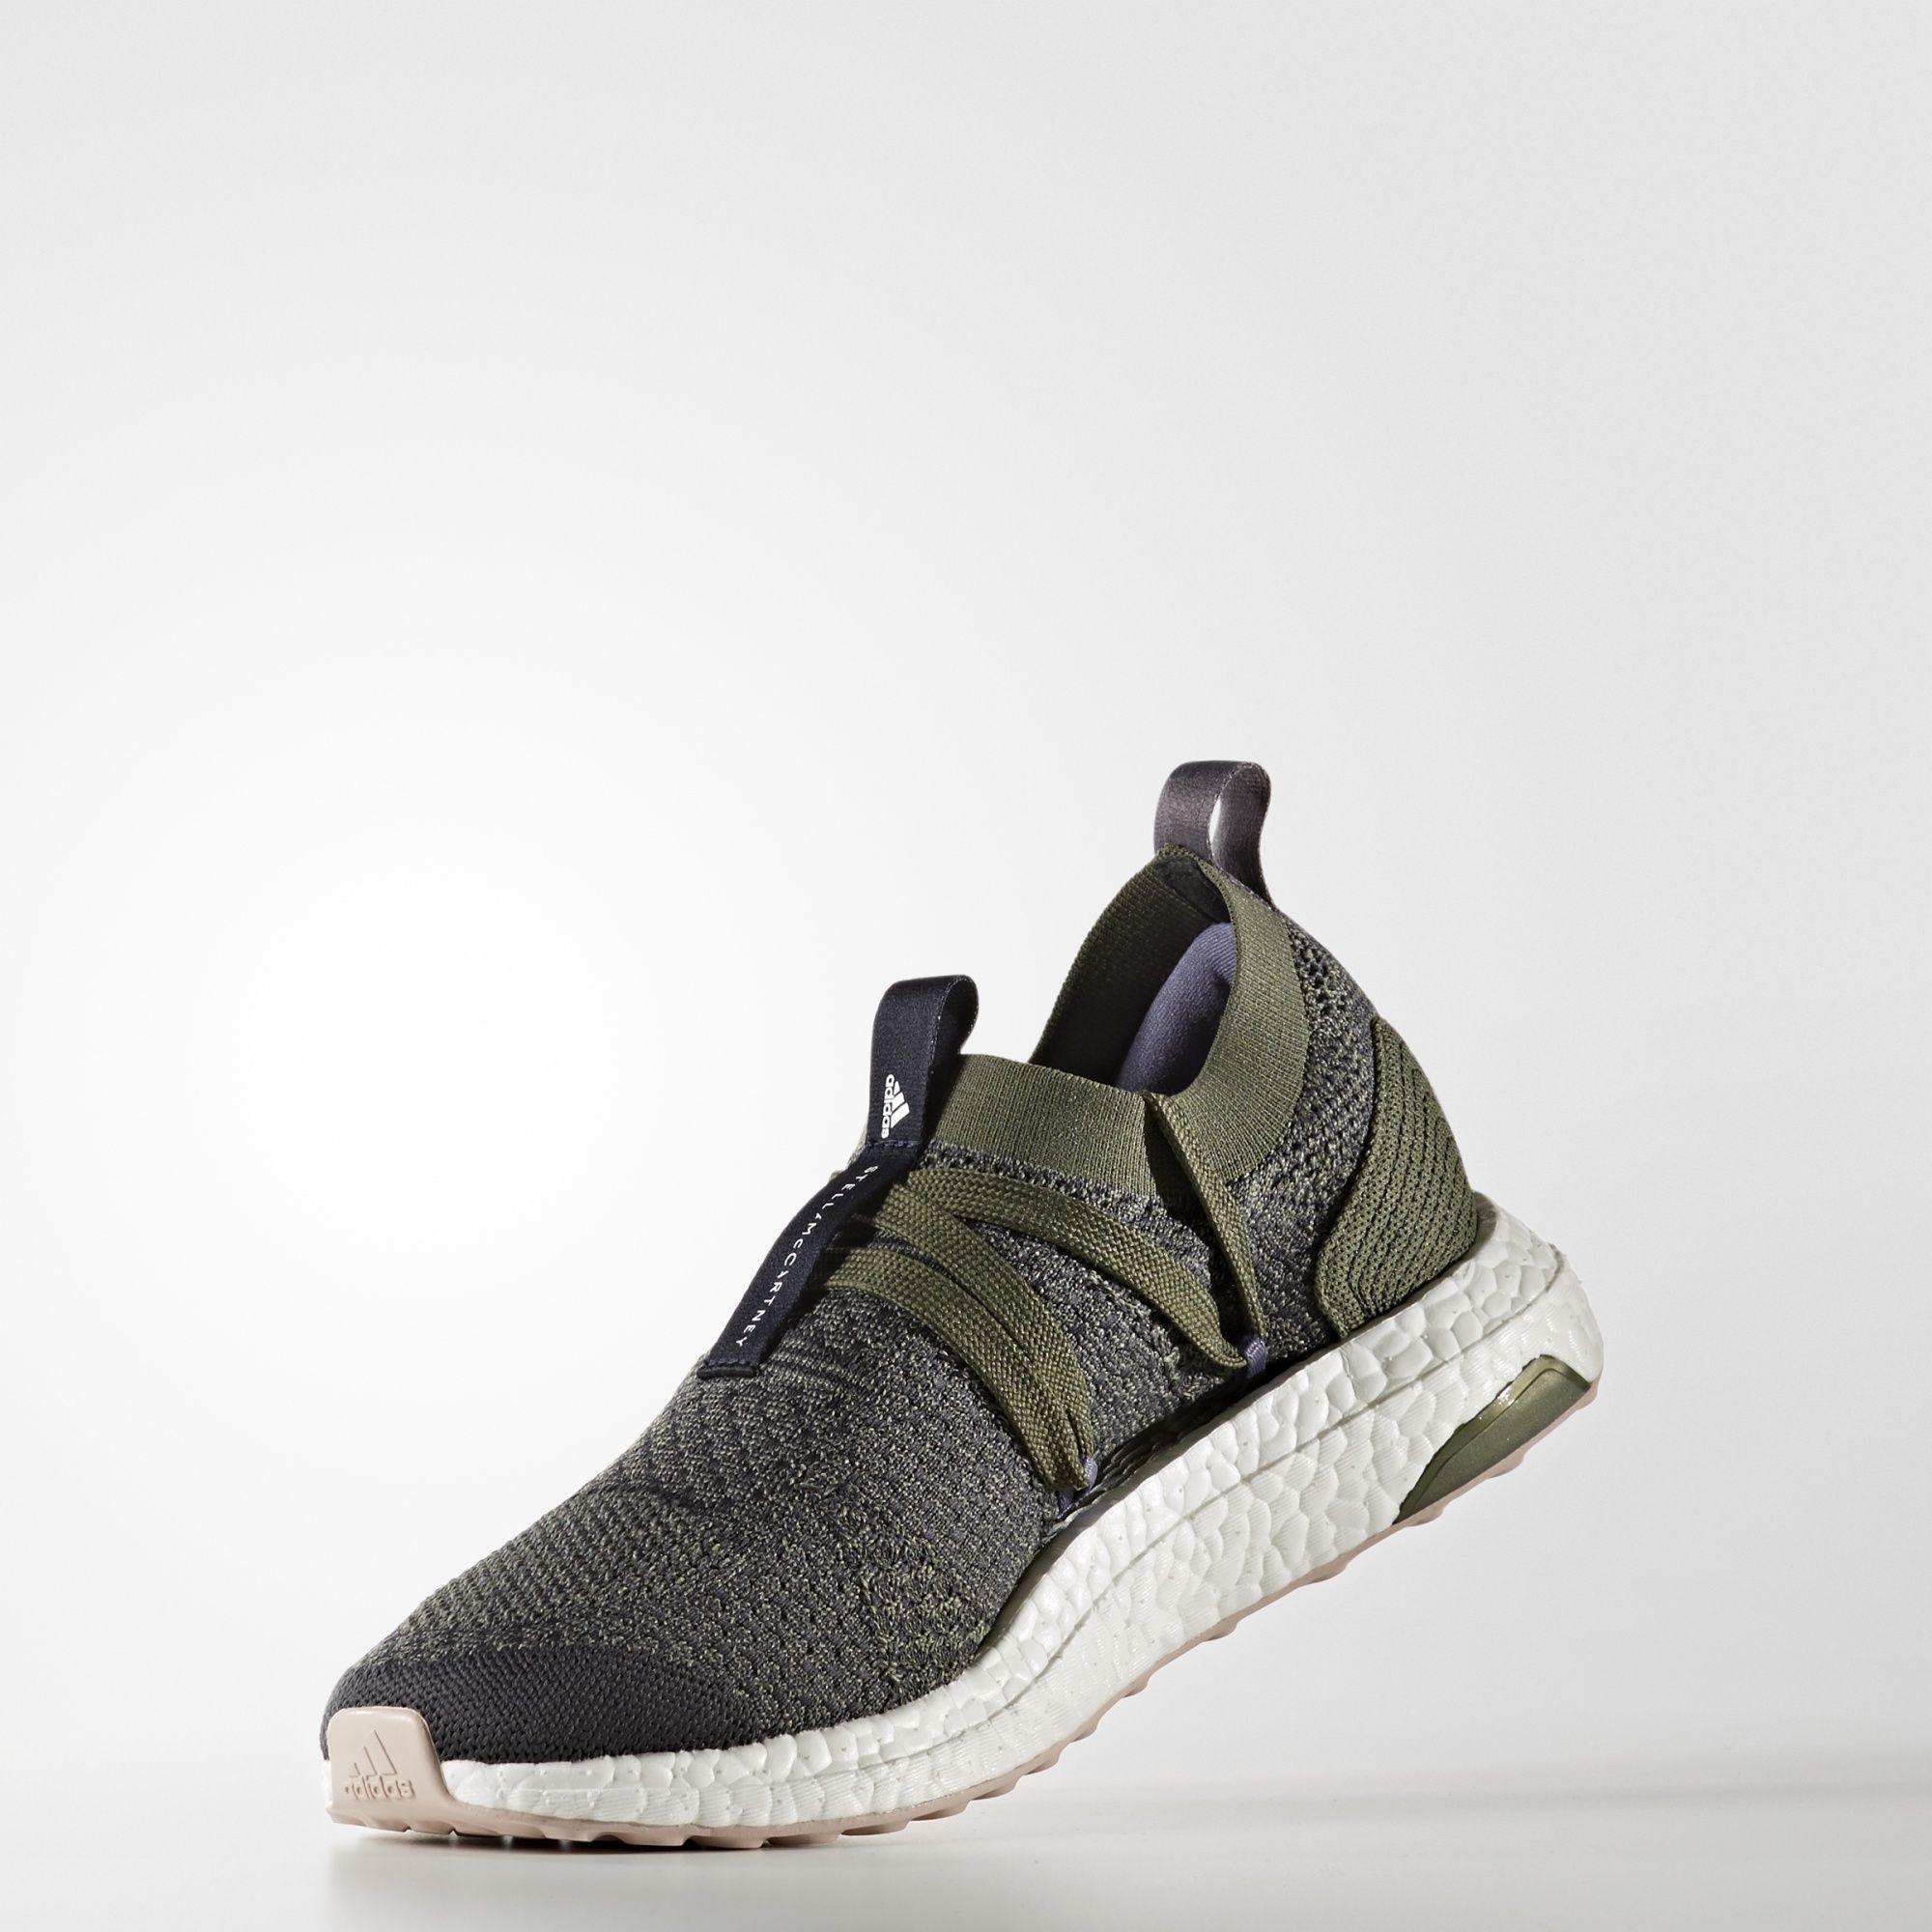 657582db8bd1e adidas - Ultraboost X Parley Shoes